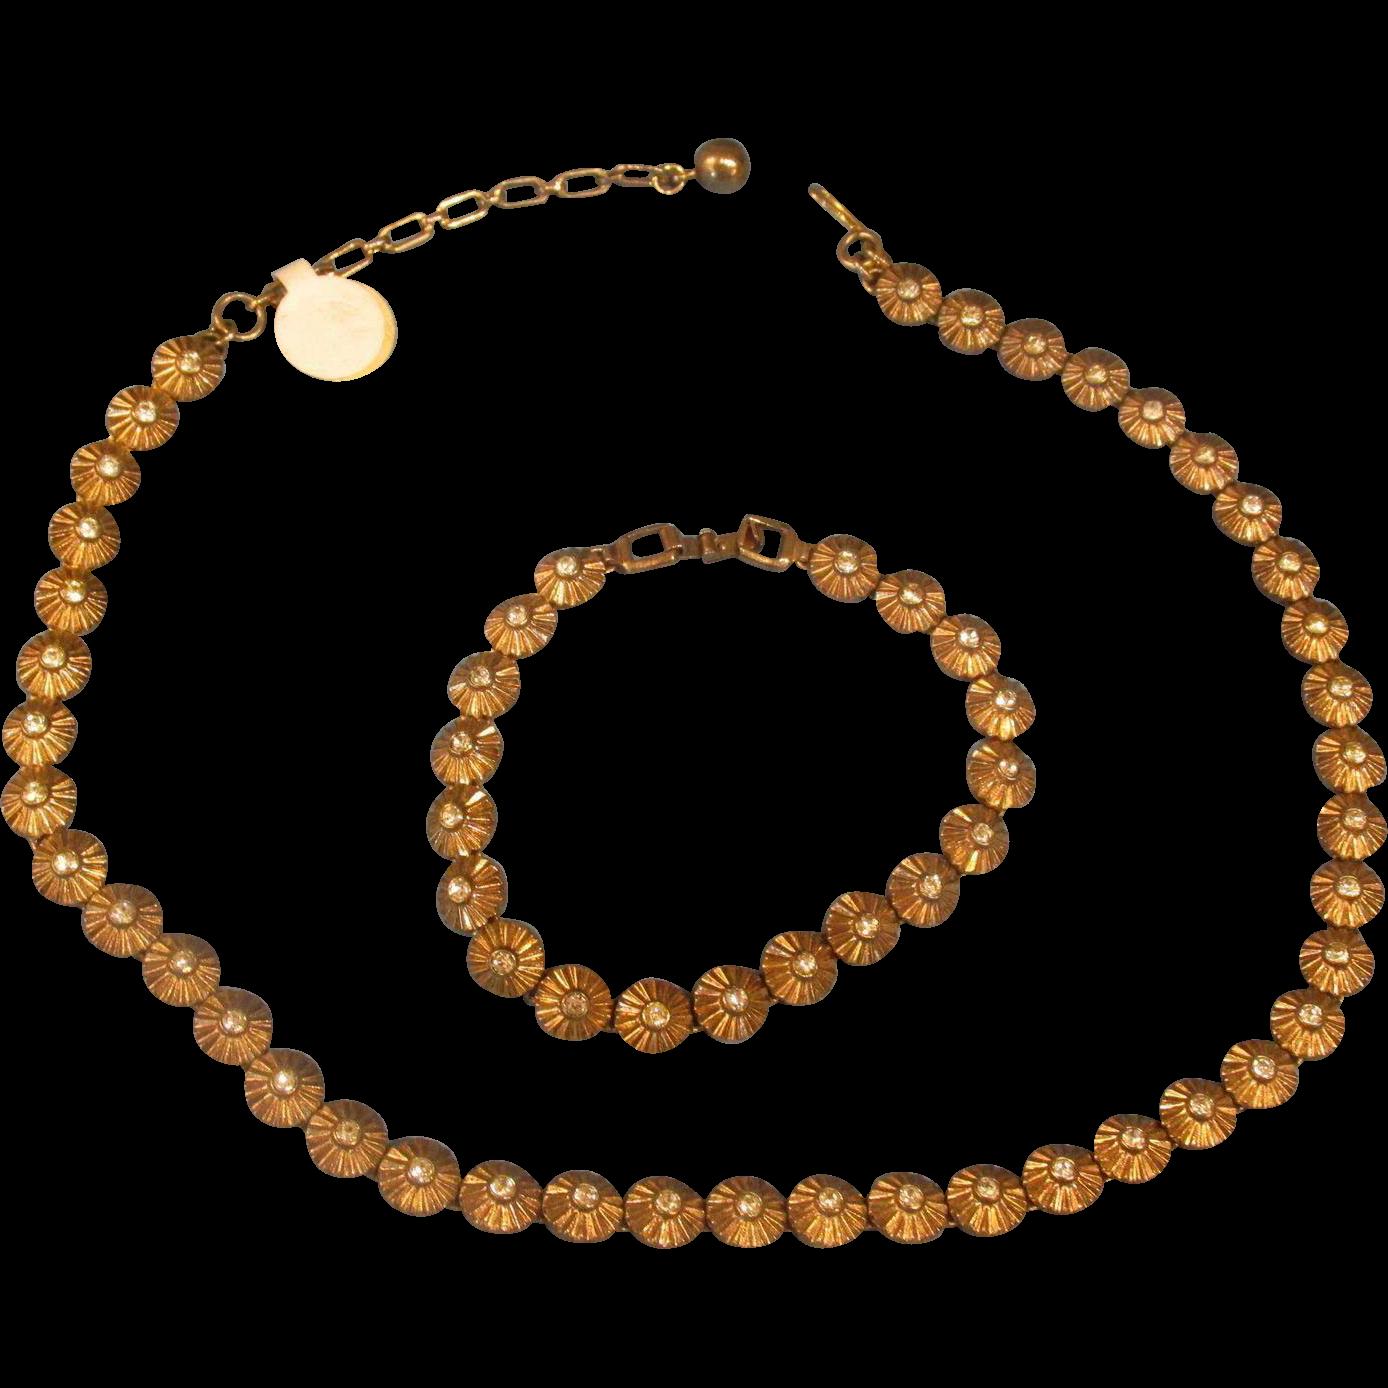 Trifari Necklace & Tennis Bracelet Clear Crystals